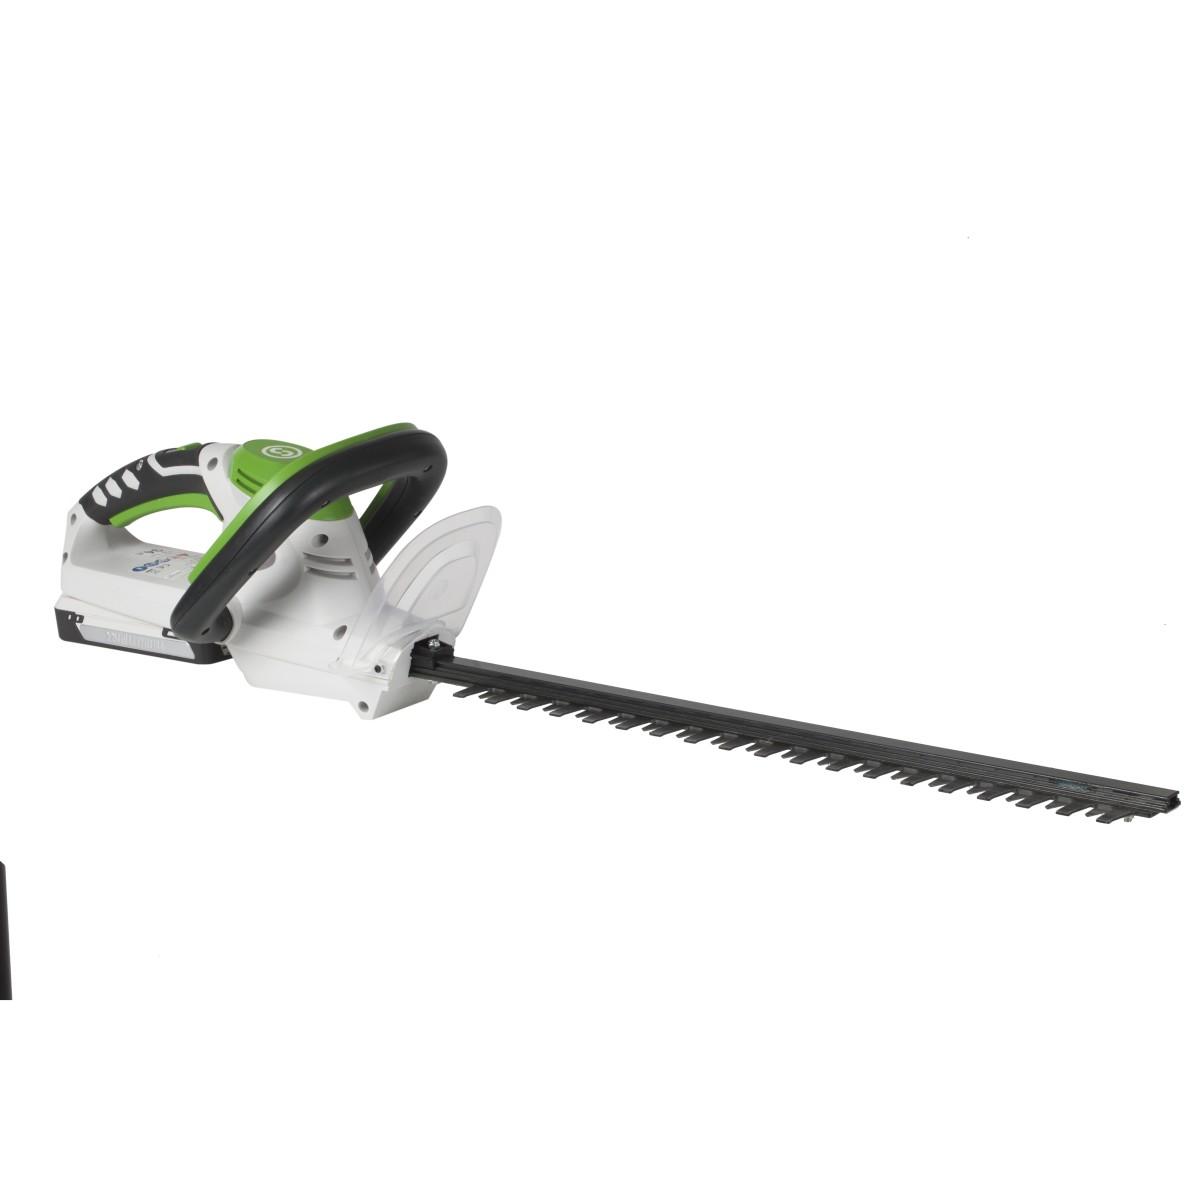 Tagliasiepi elettrico batteria greenworks g max 24v prezzo e offerte sottocosto for Scaldasalviette elettrico leroy merlin